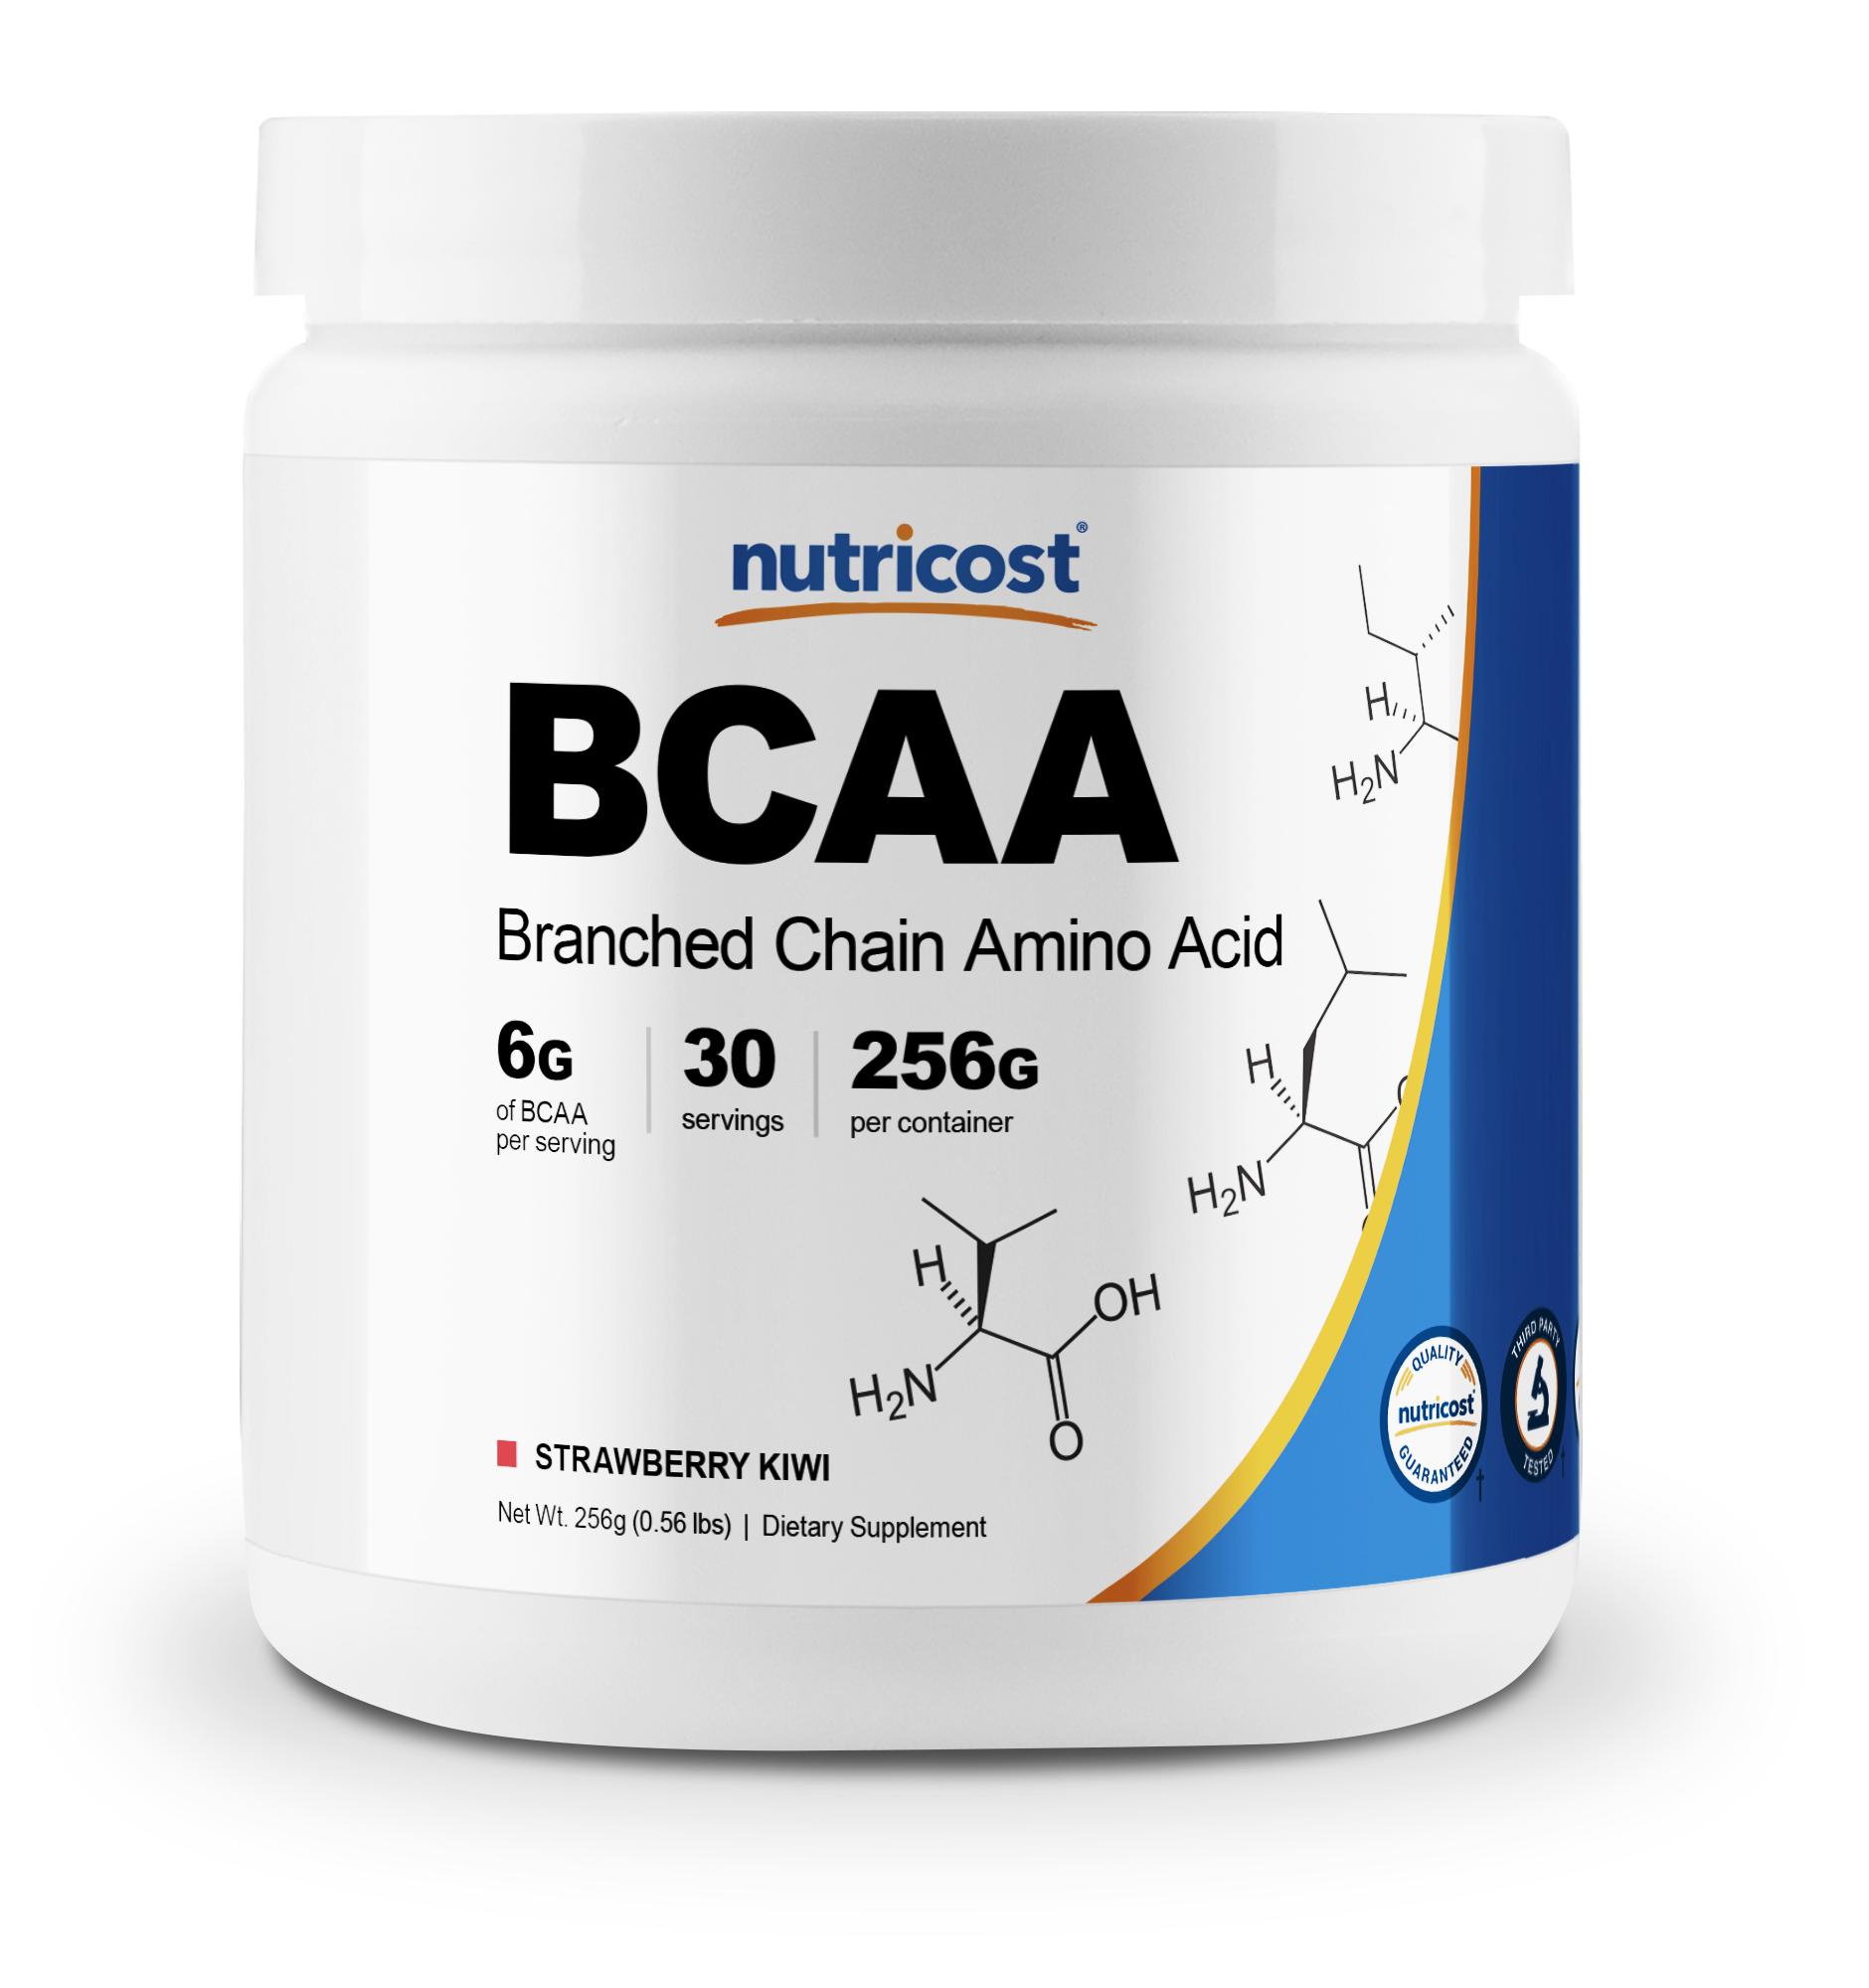 Nutricost BCAA